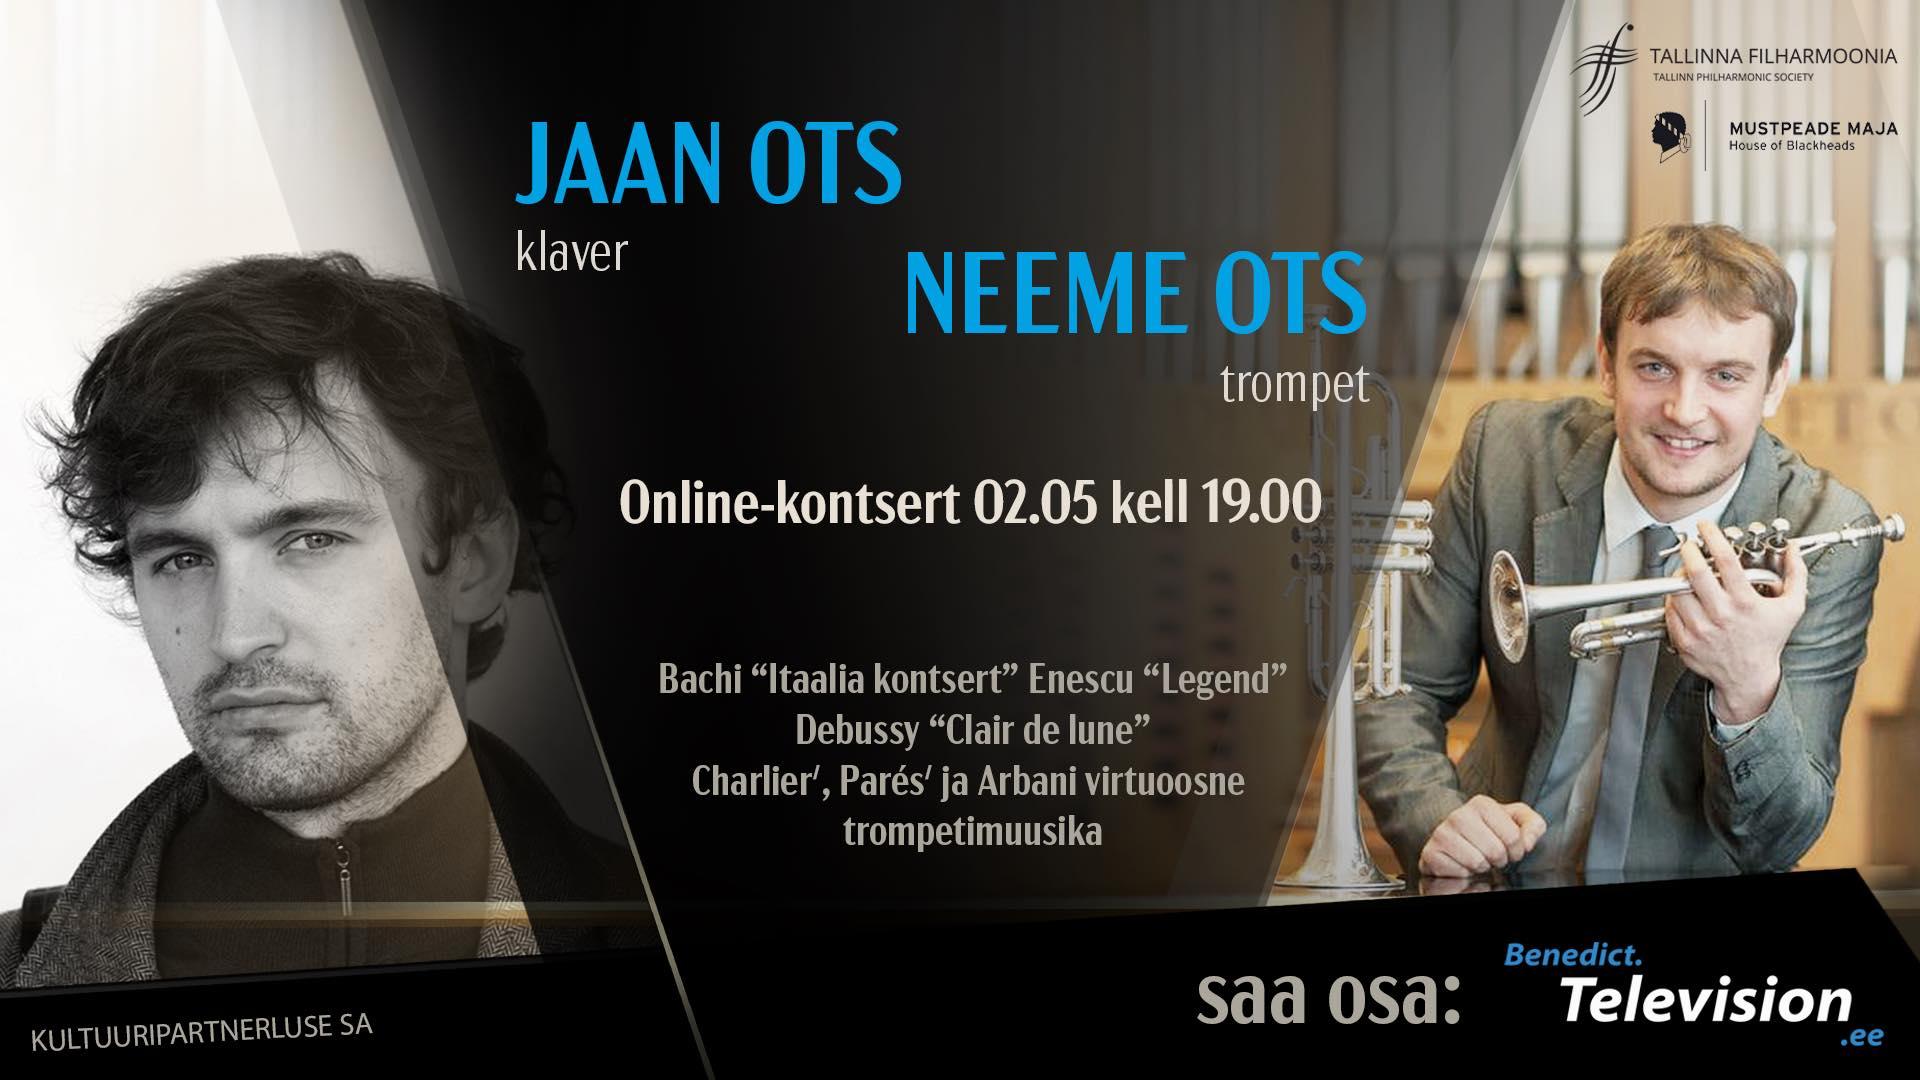 Jaan Ots (klaver) ja Neeme Ots (trompet) / Online-kontsert